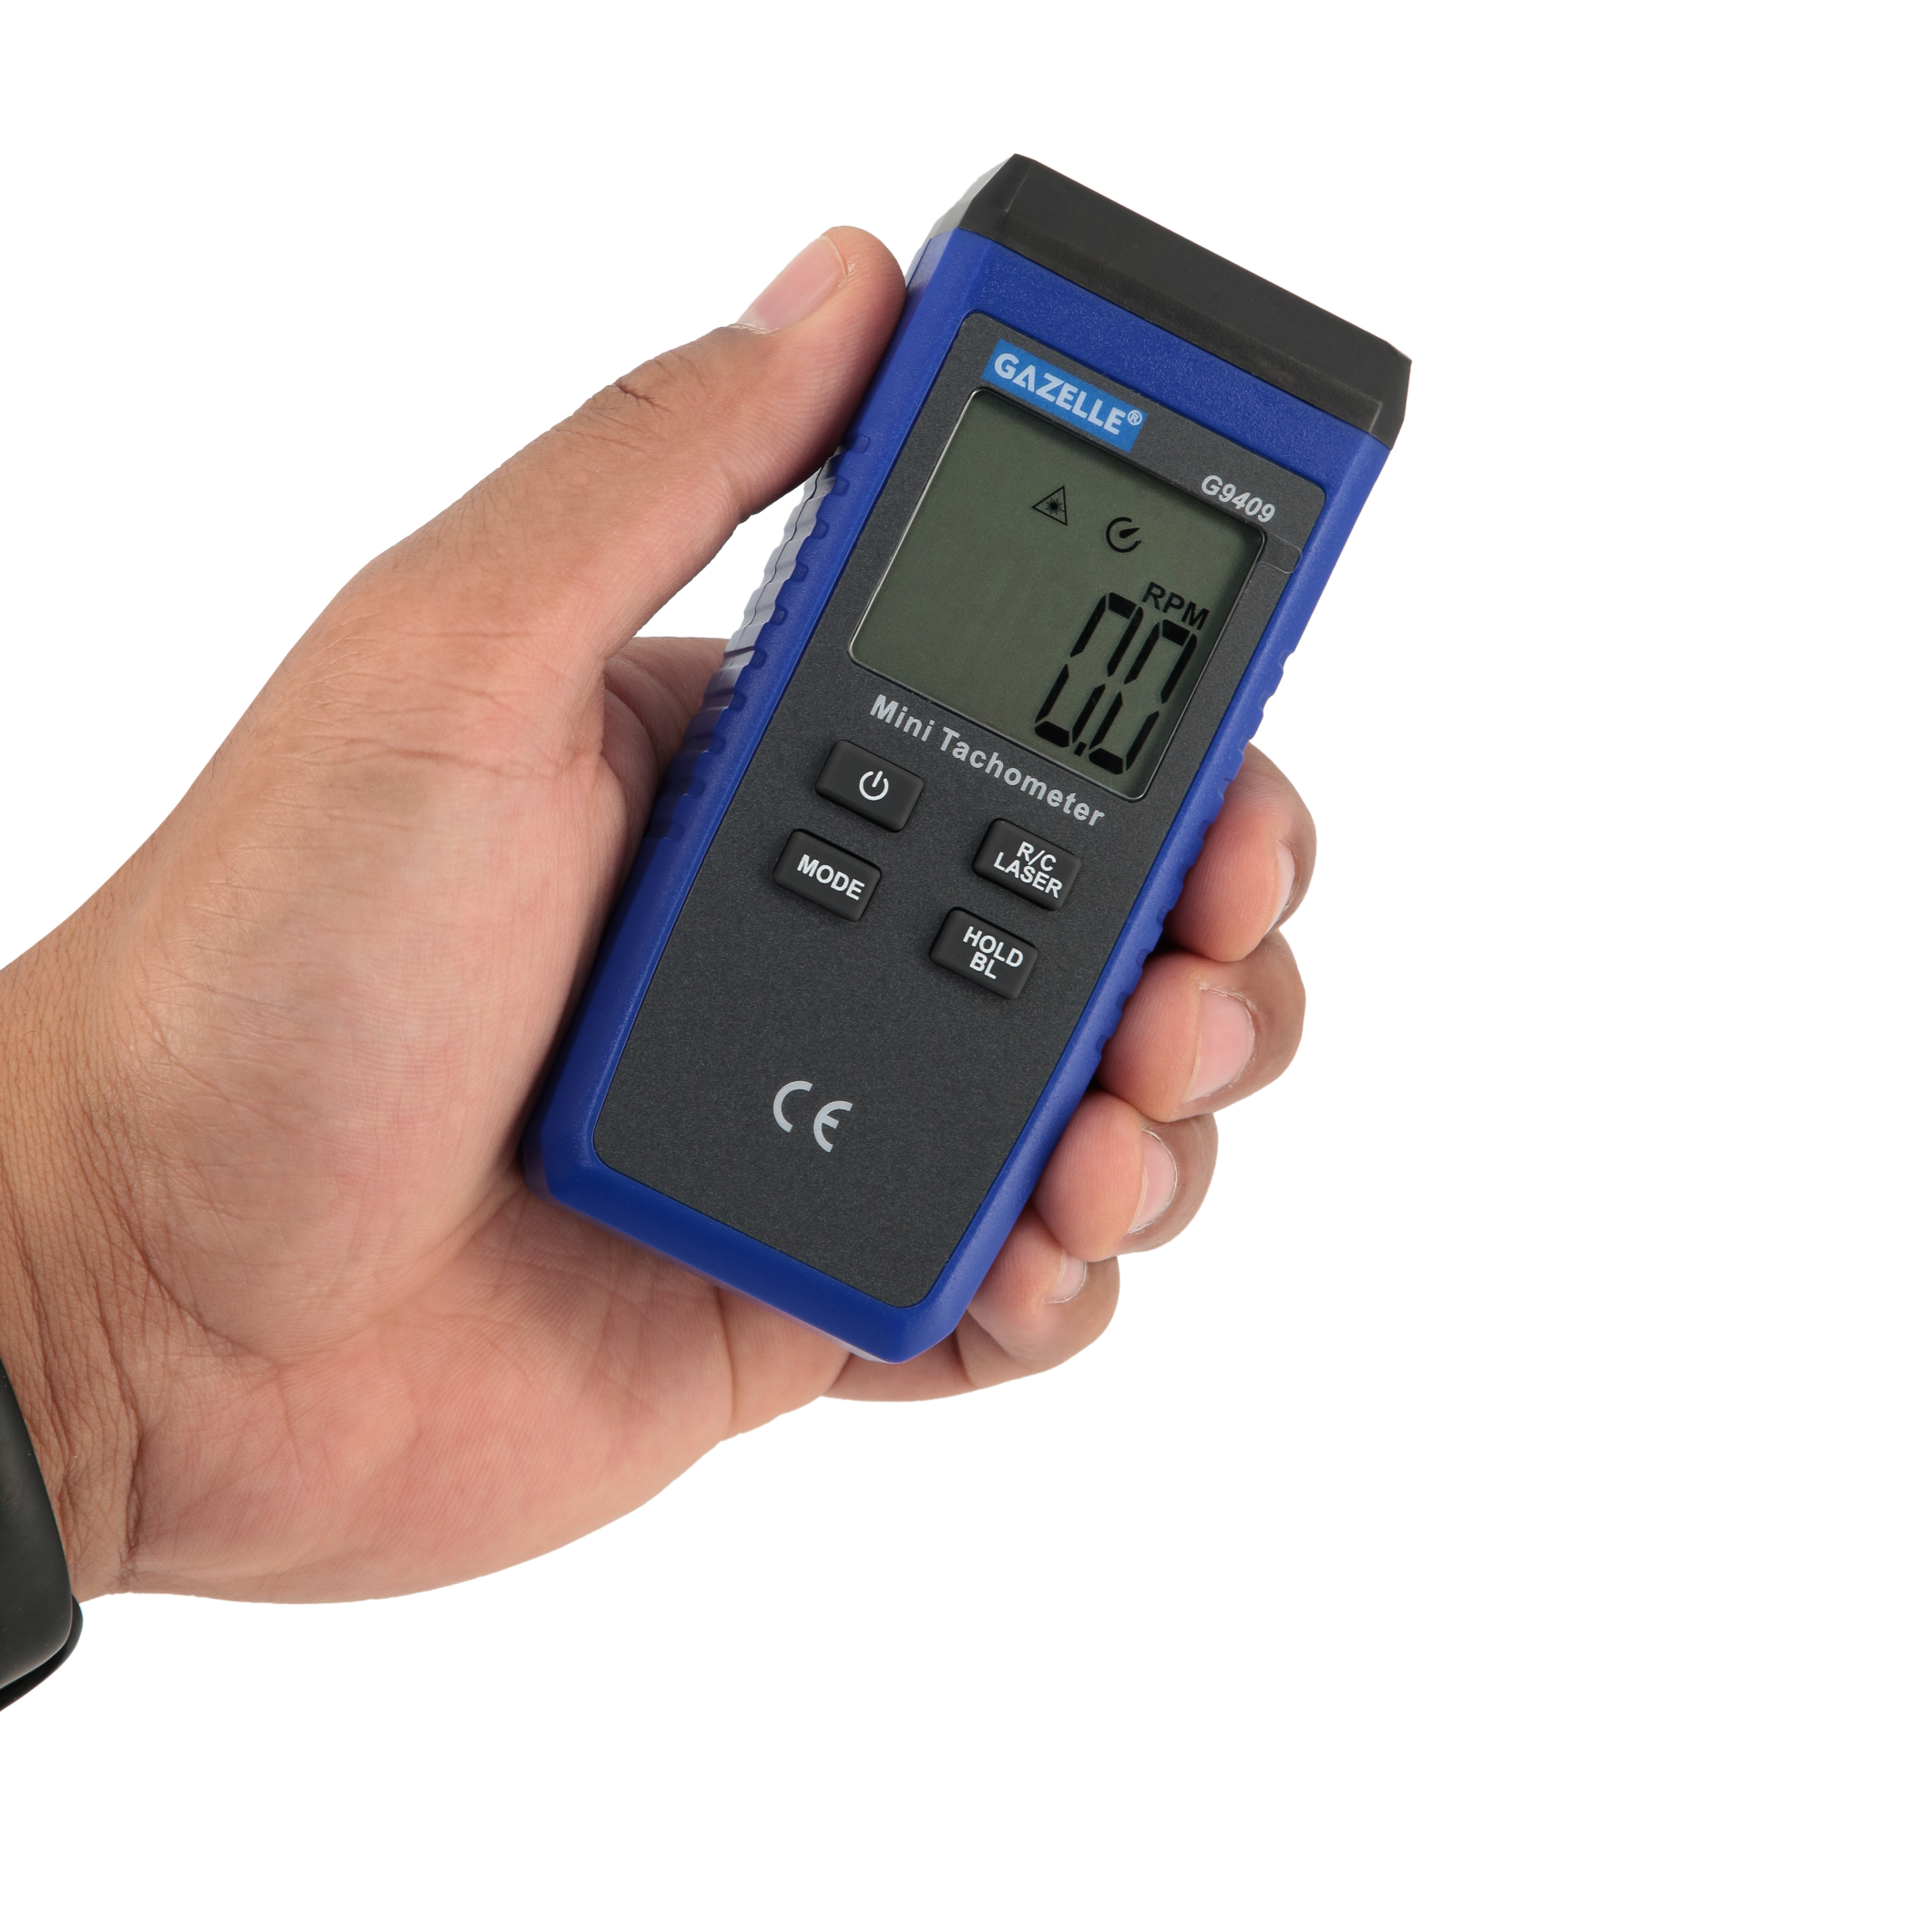 GAZELLE G9403 - Mini Infrared Thermometer